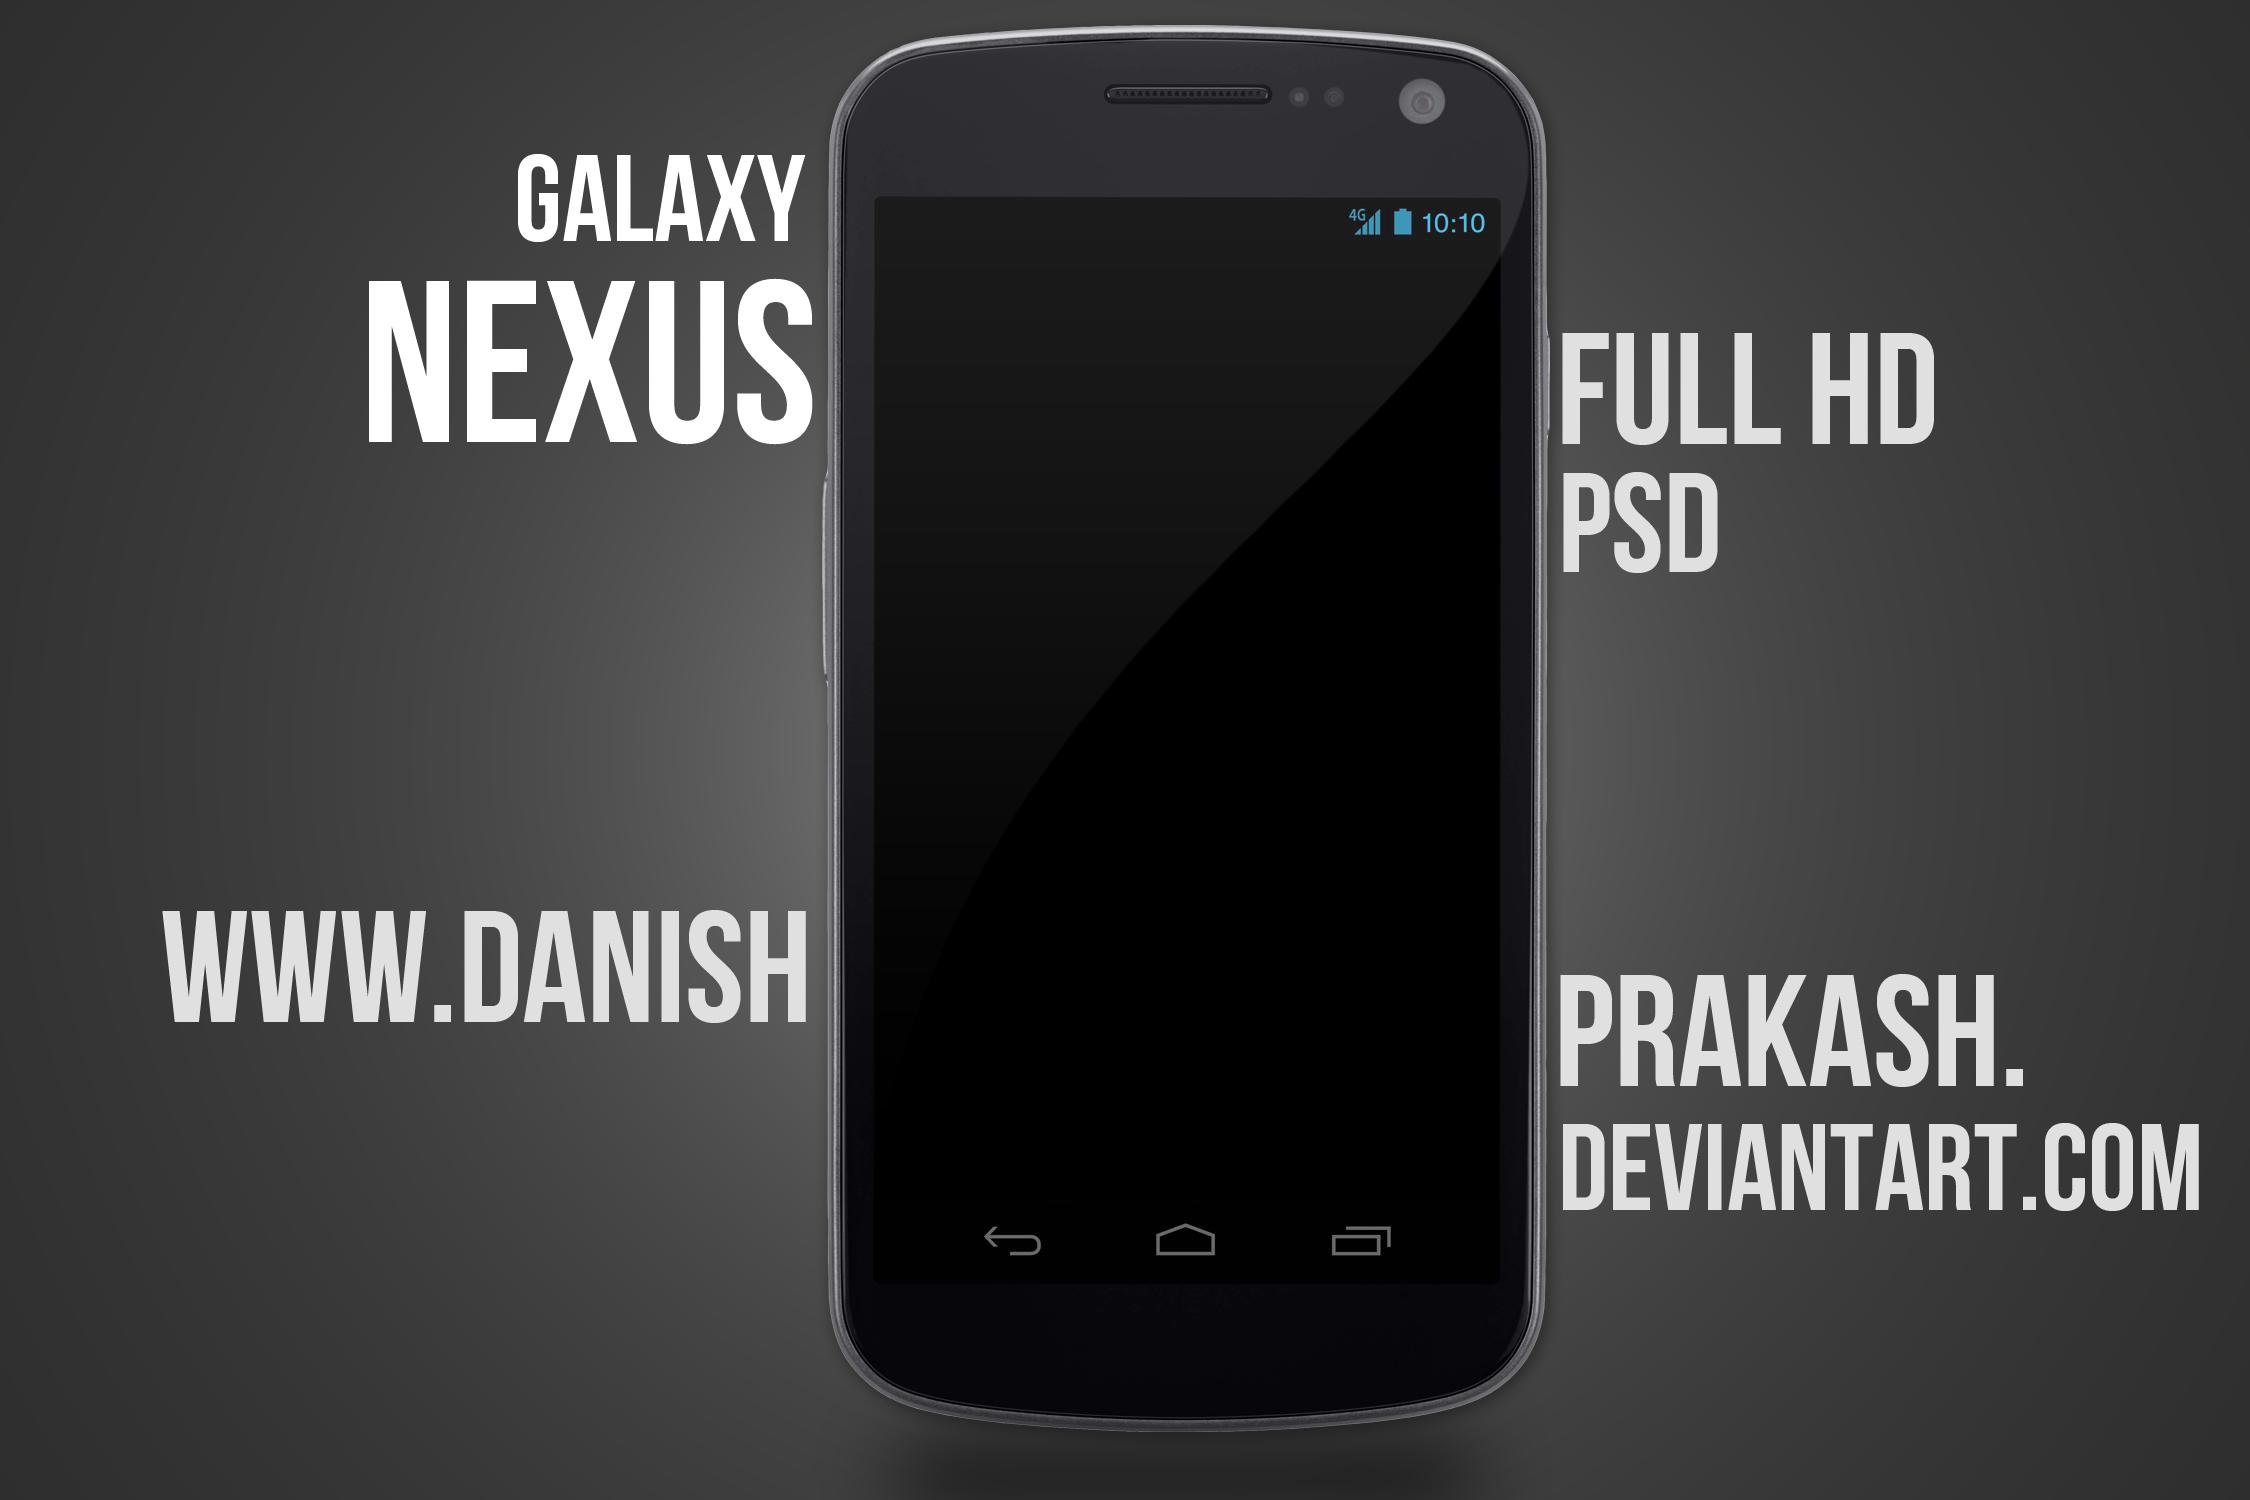 Galaxy Nexus [psd]